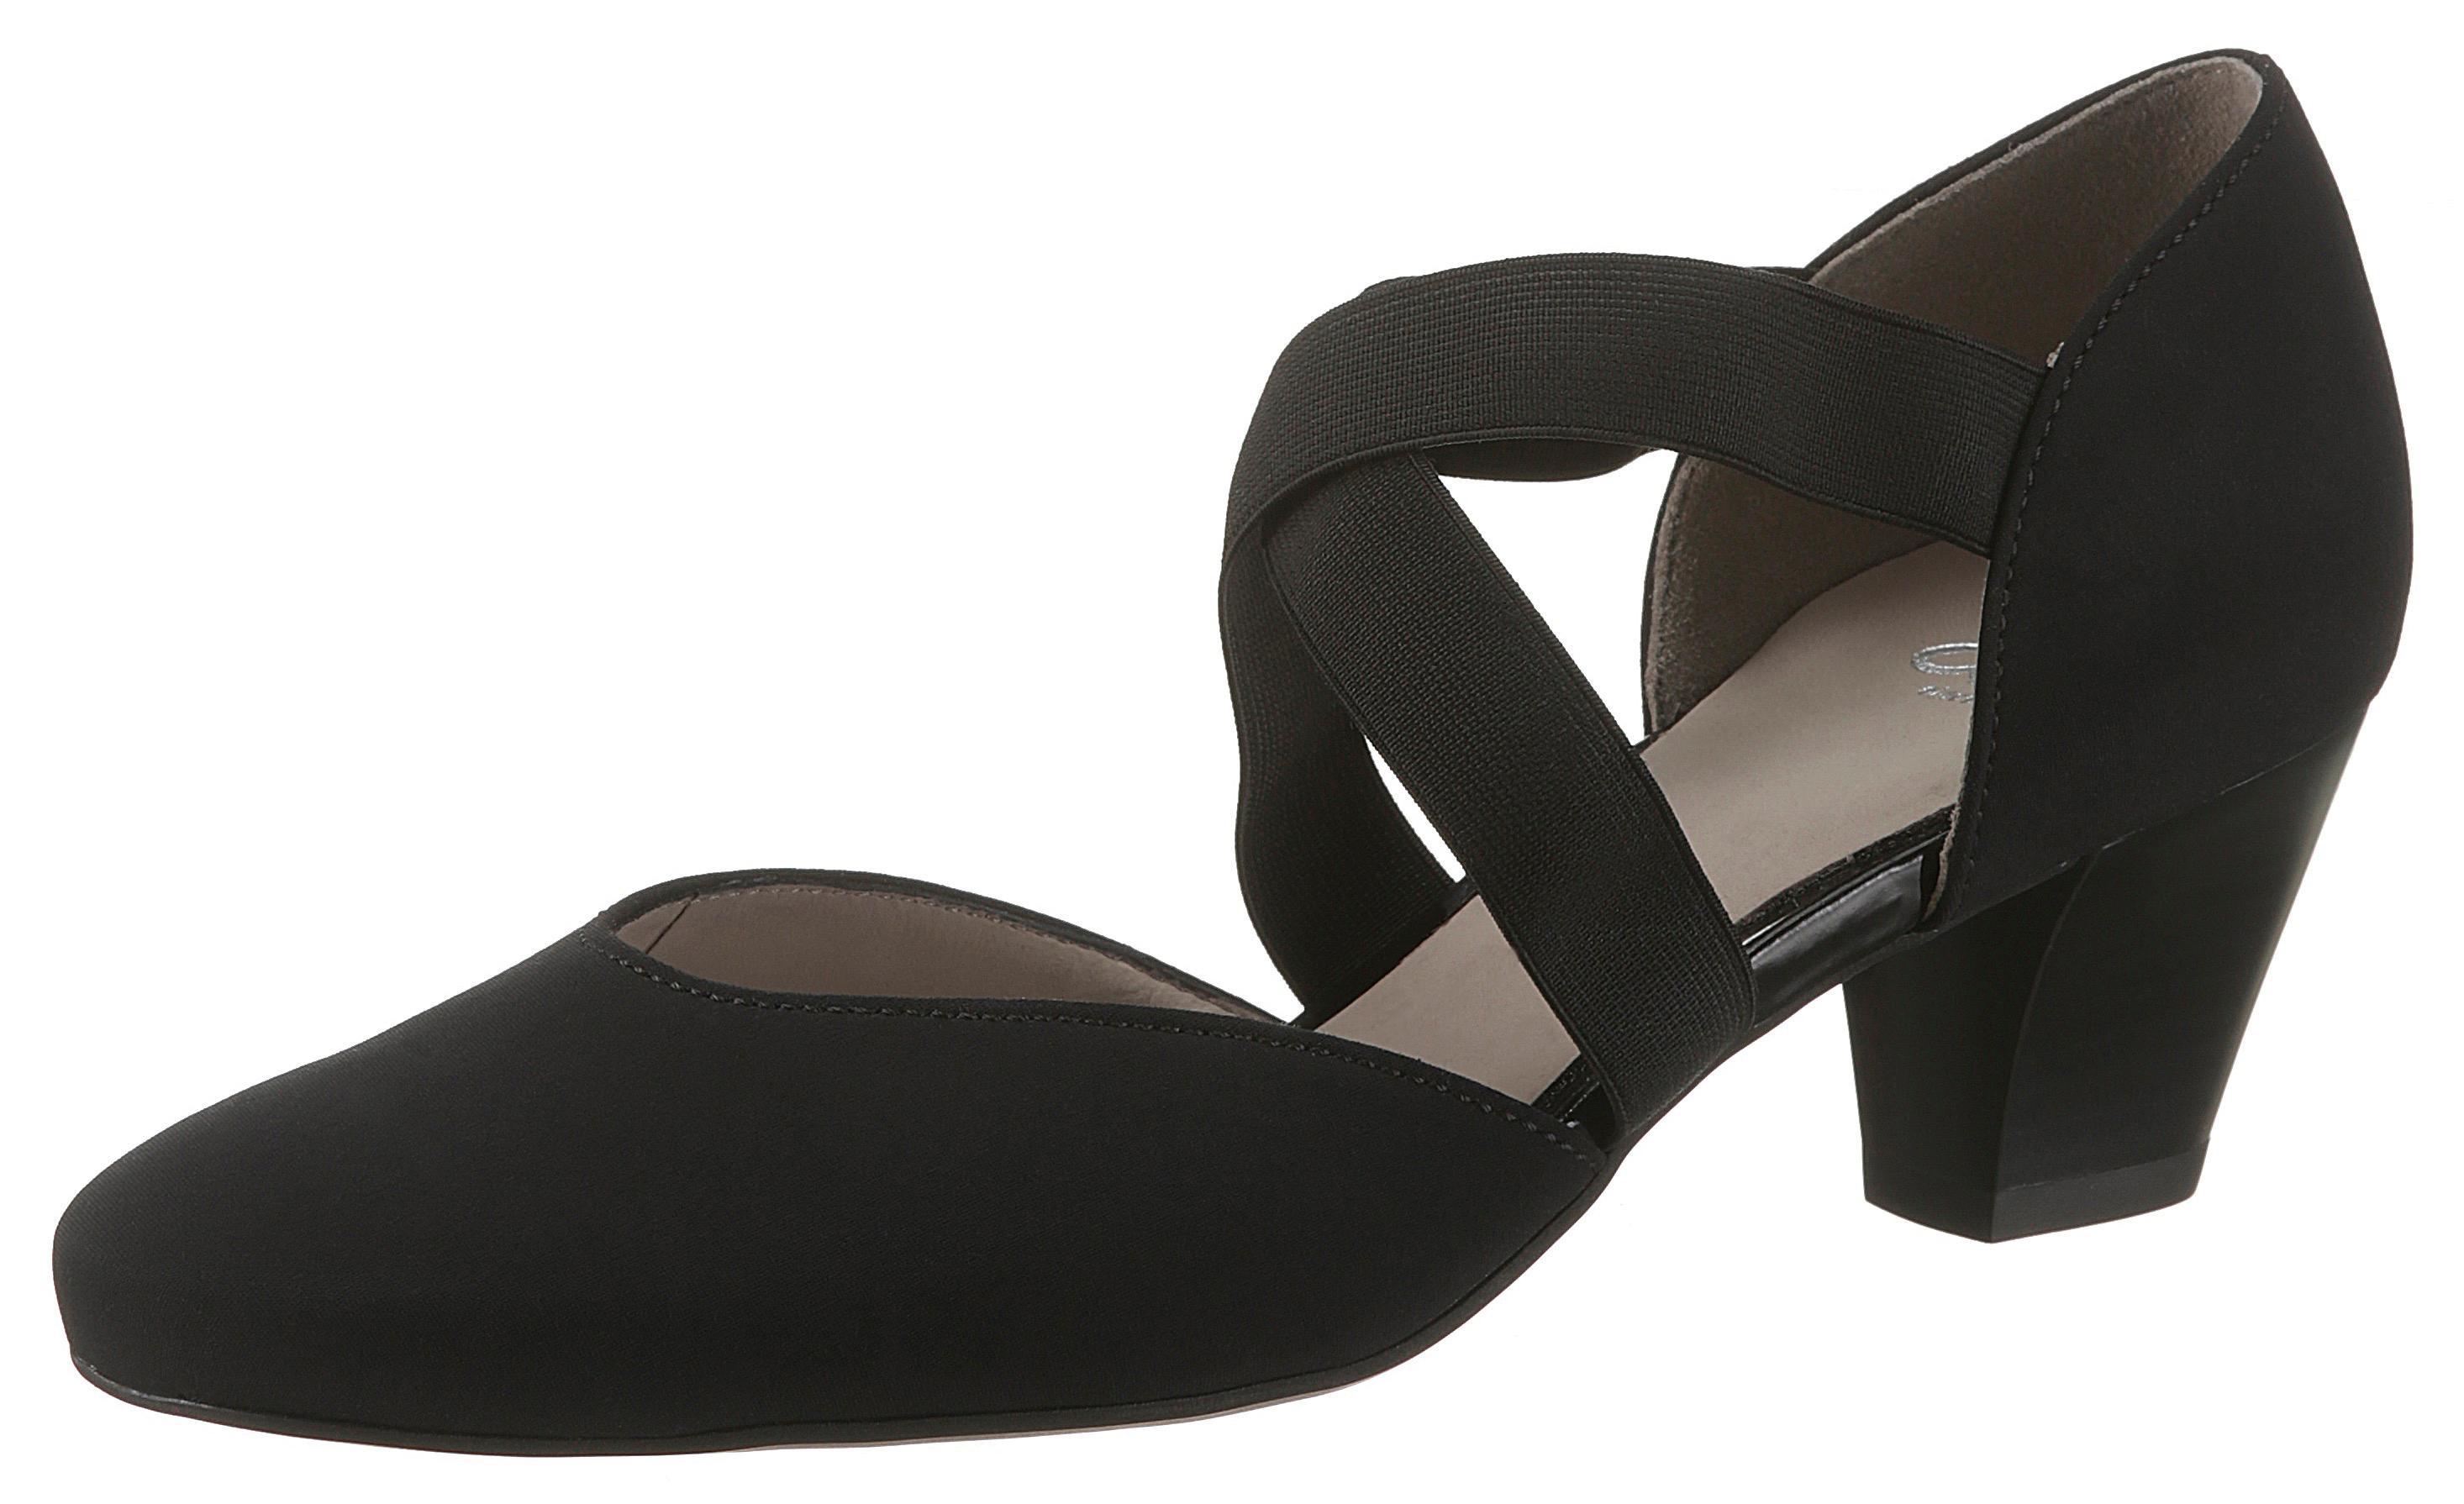 Ara Spangenpumps TOULOUSE | Schuhe > Pumps > Spangenpumps | Ara